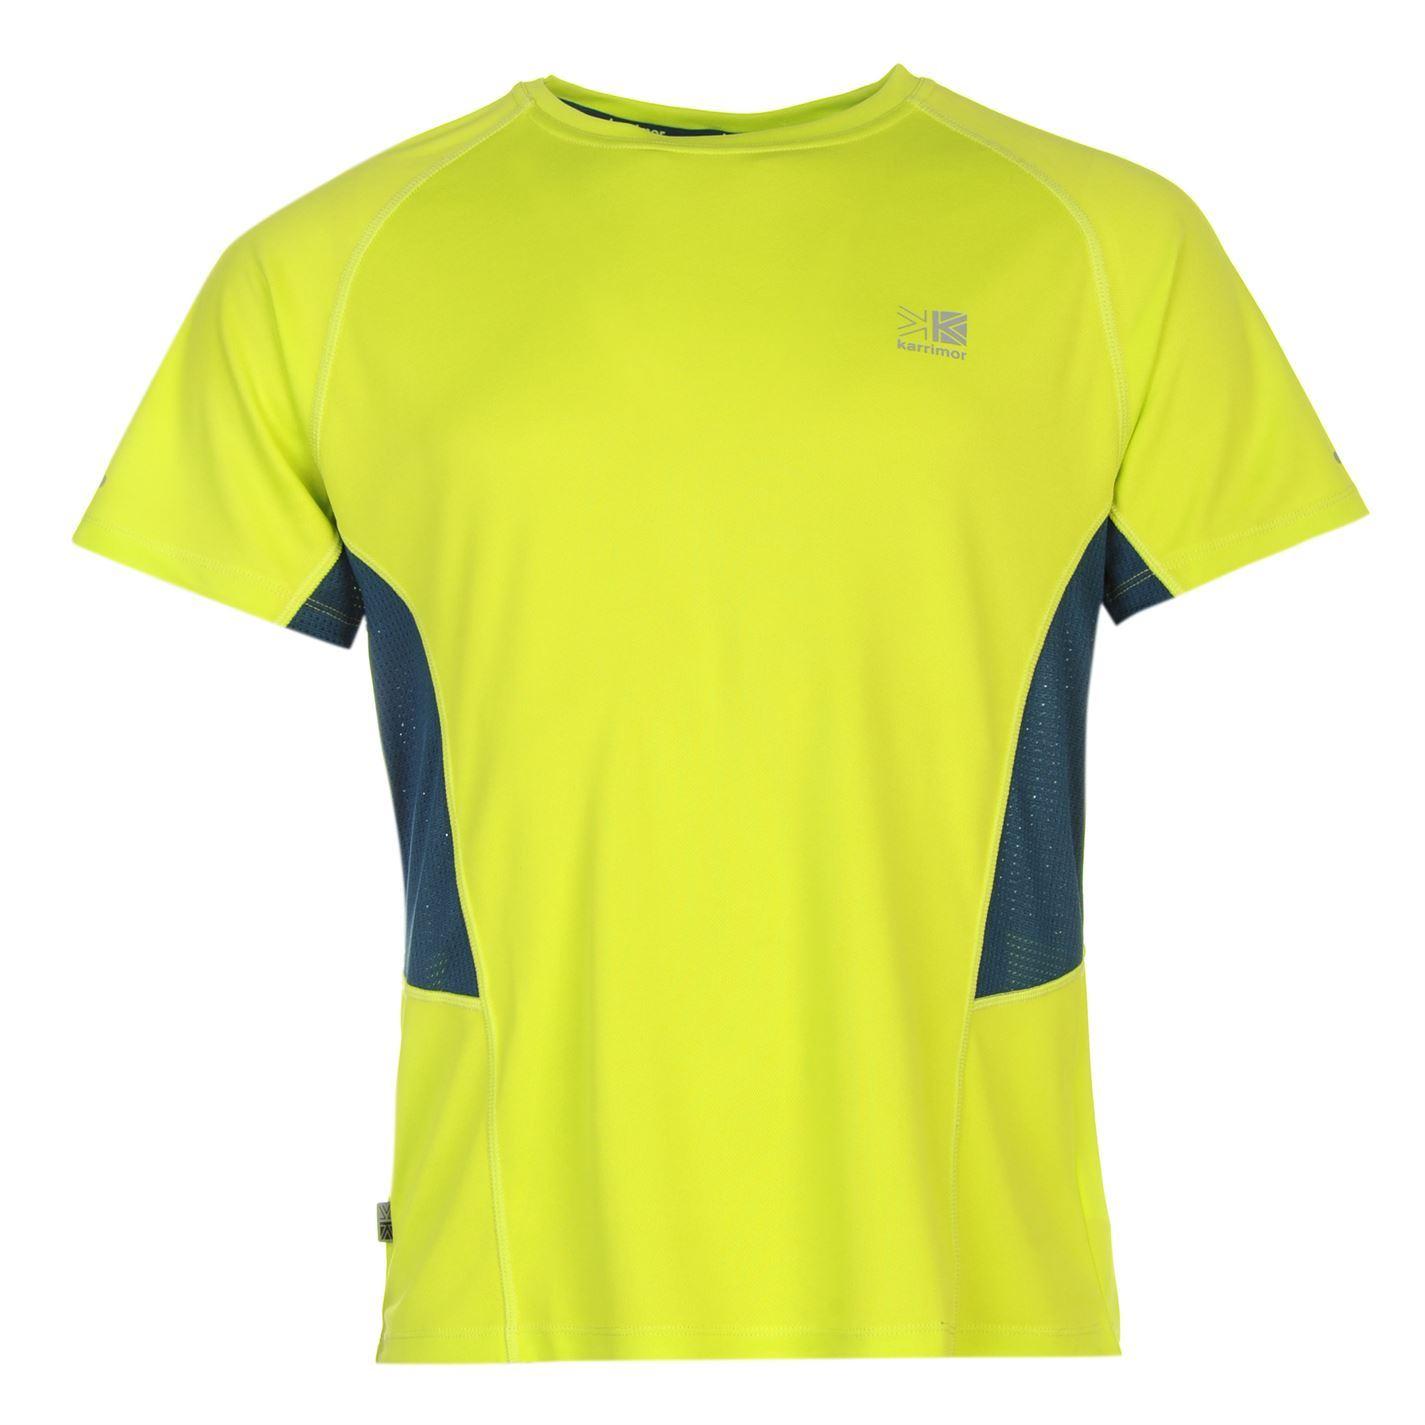 karrimor mens short sleeve run t shirt breathable running jogging sport top ebay. Black Bedroom Furniture Sets. Home Design Ideas